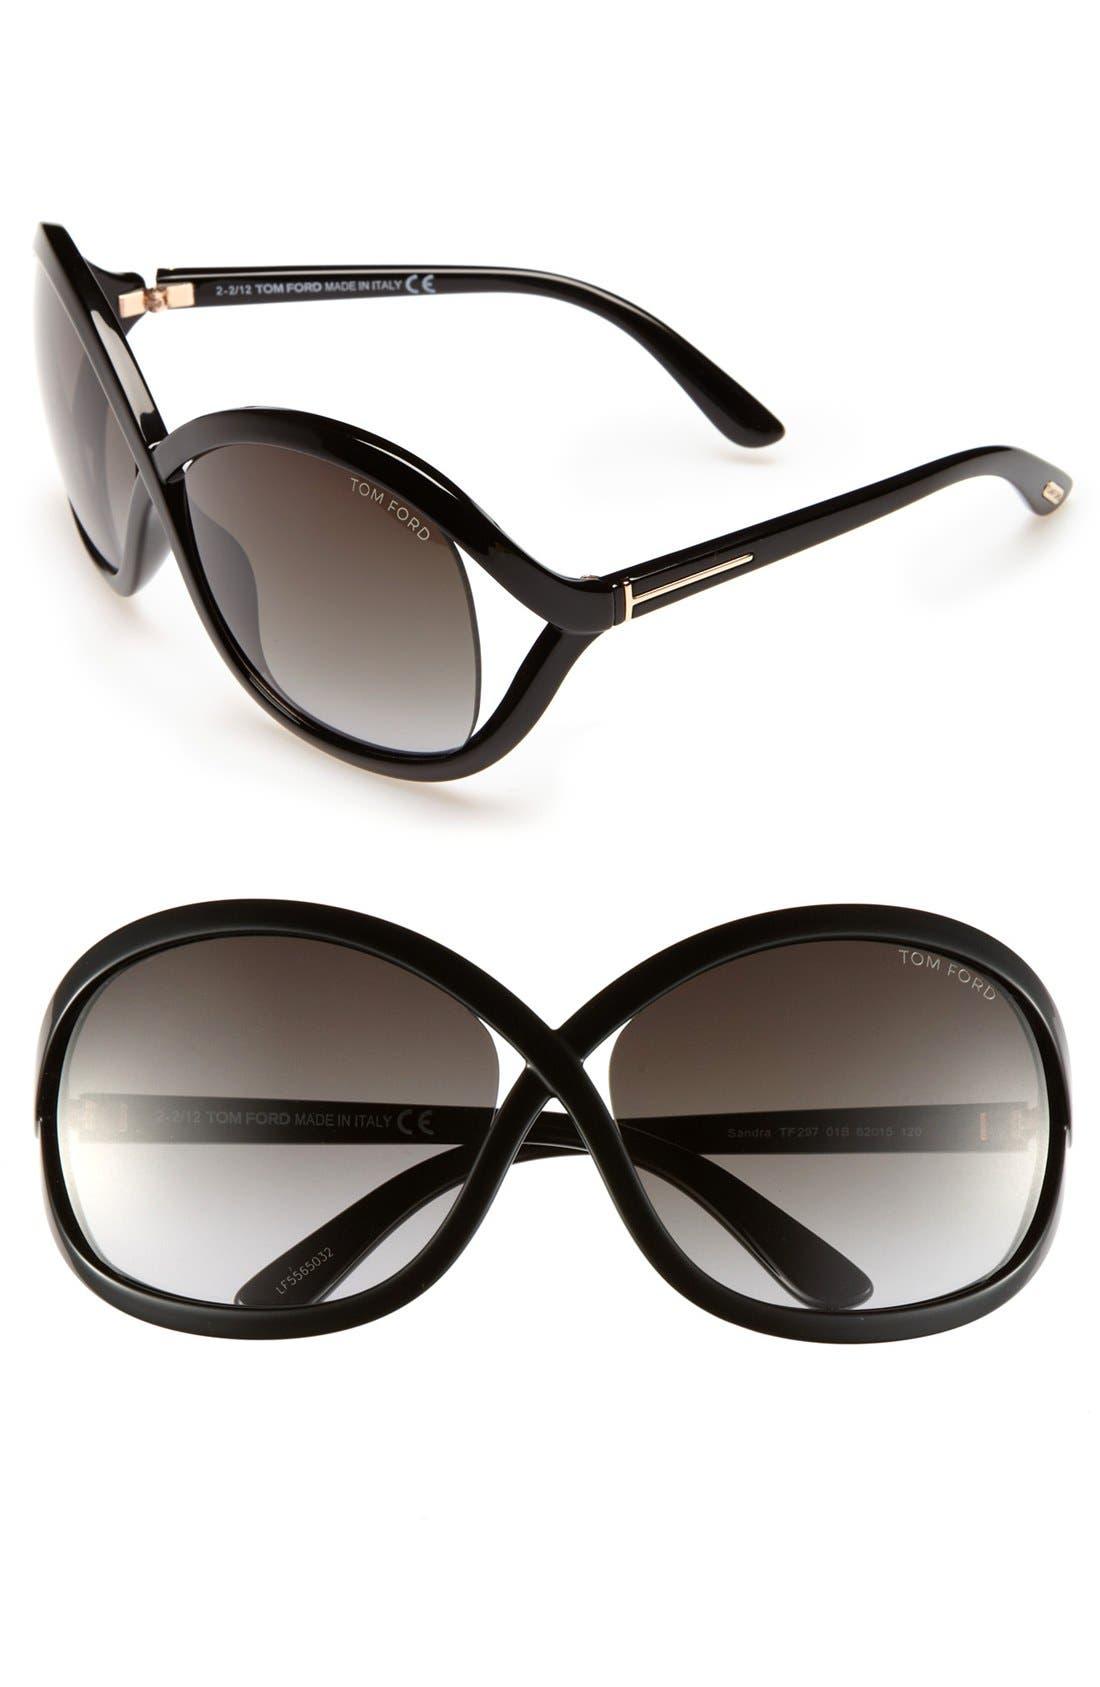 Main Image - Tom Ford 'Sandra' 62mm Sunglasses